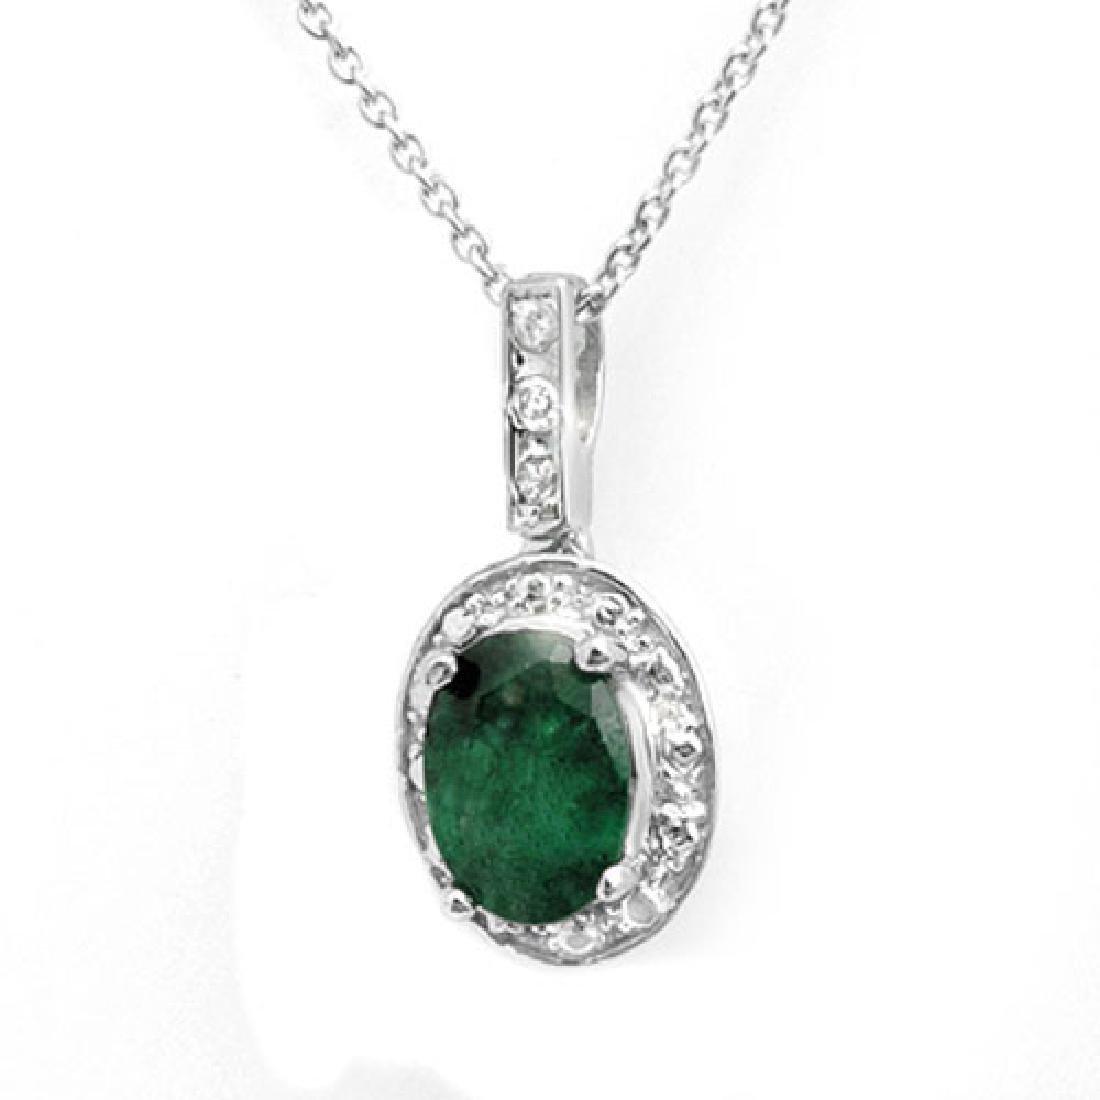 1.02 CTW Emerald & Diamond Pendant 14K White Gold